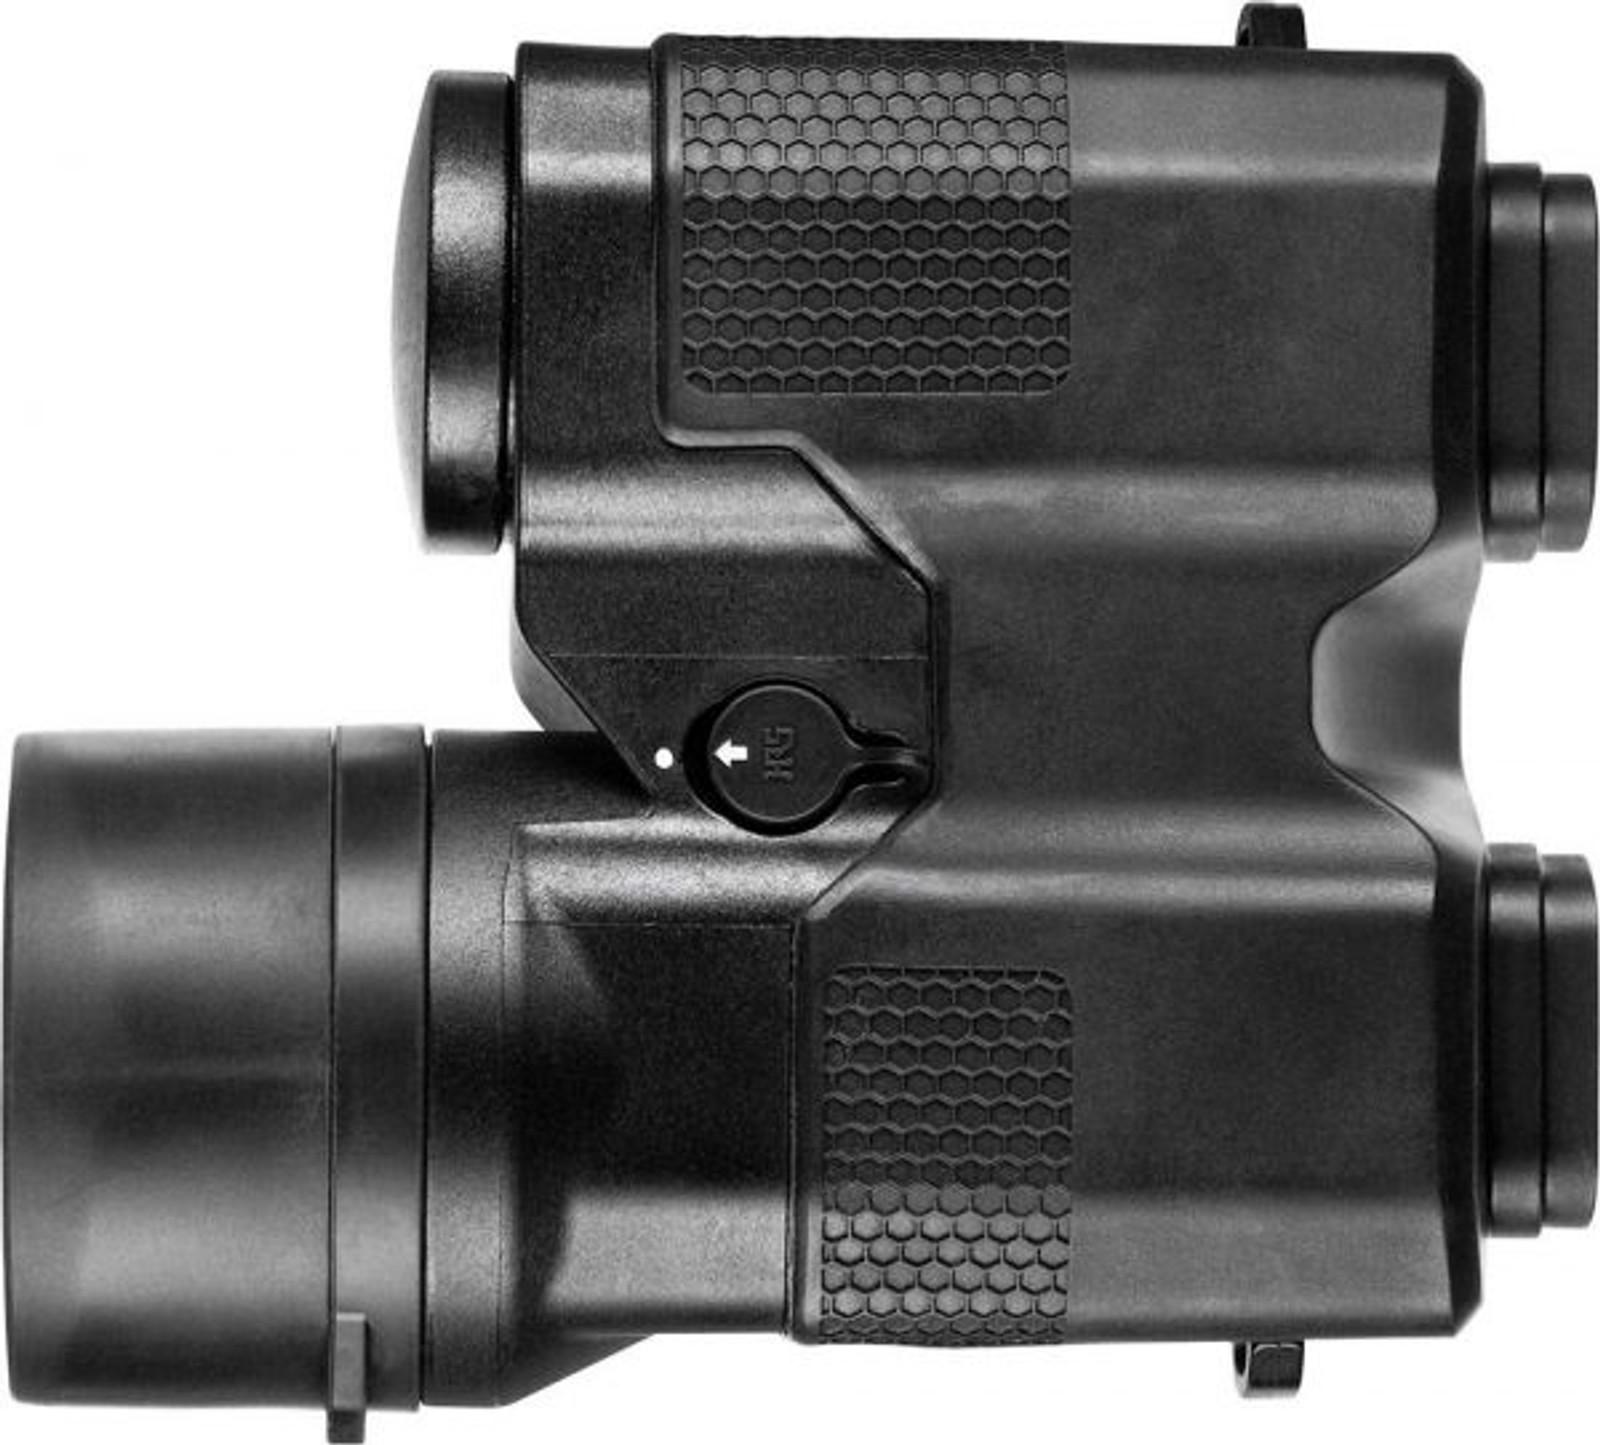 ATLAS Thermal Binocular